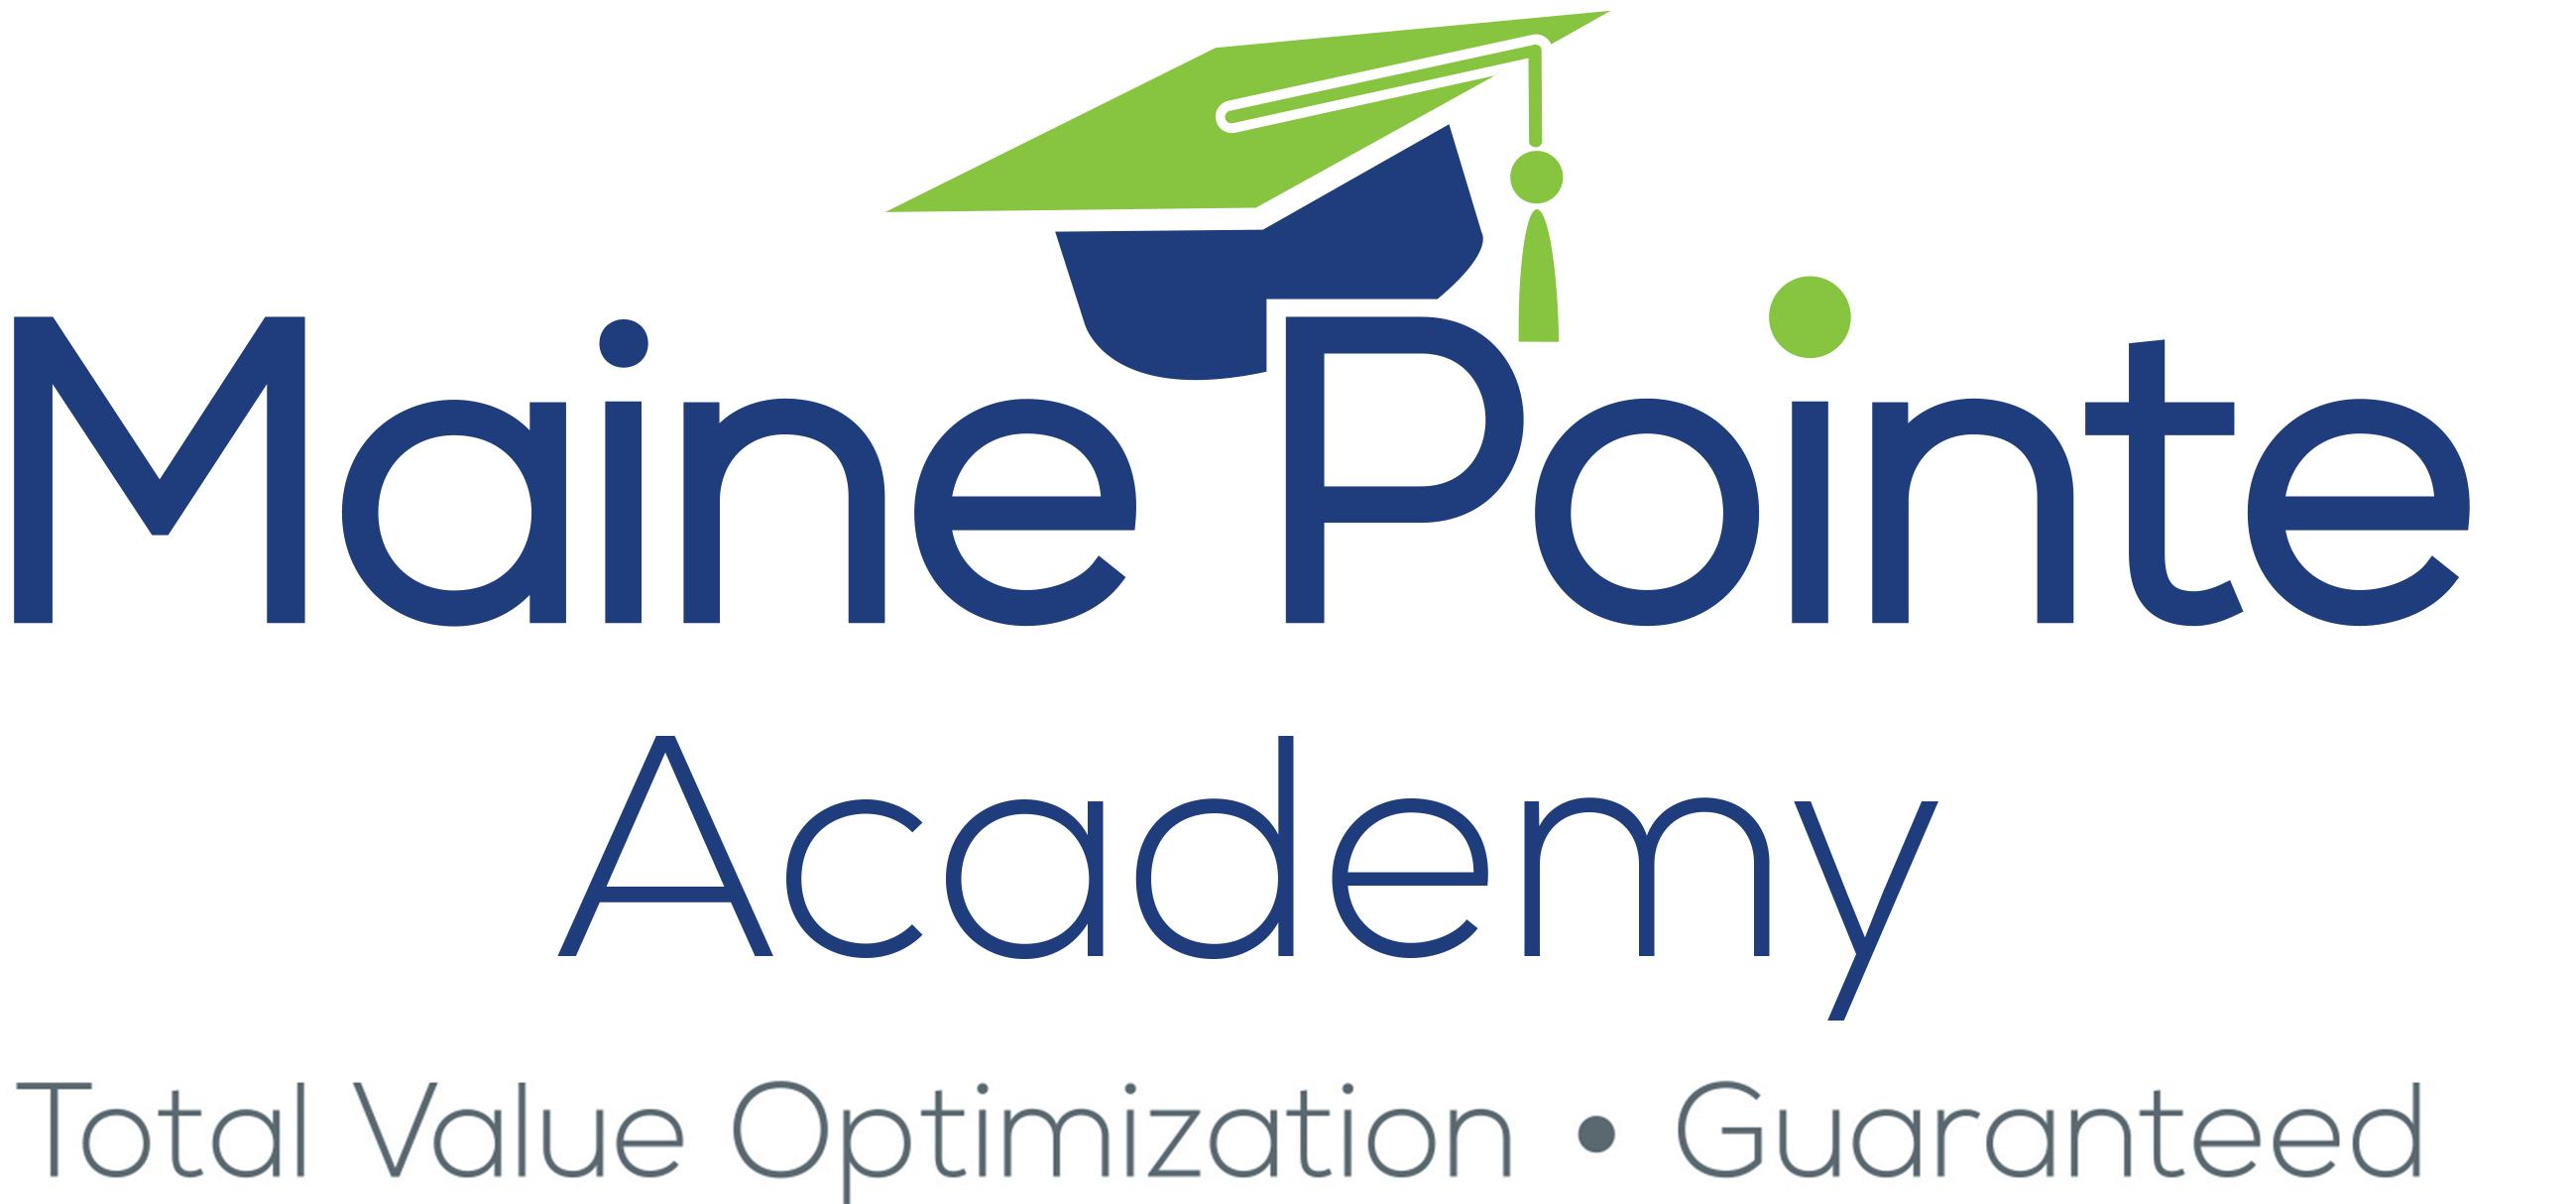 Maine Pointe Academy Logo Strap new 1